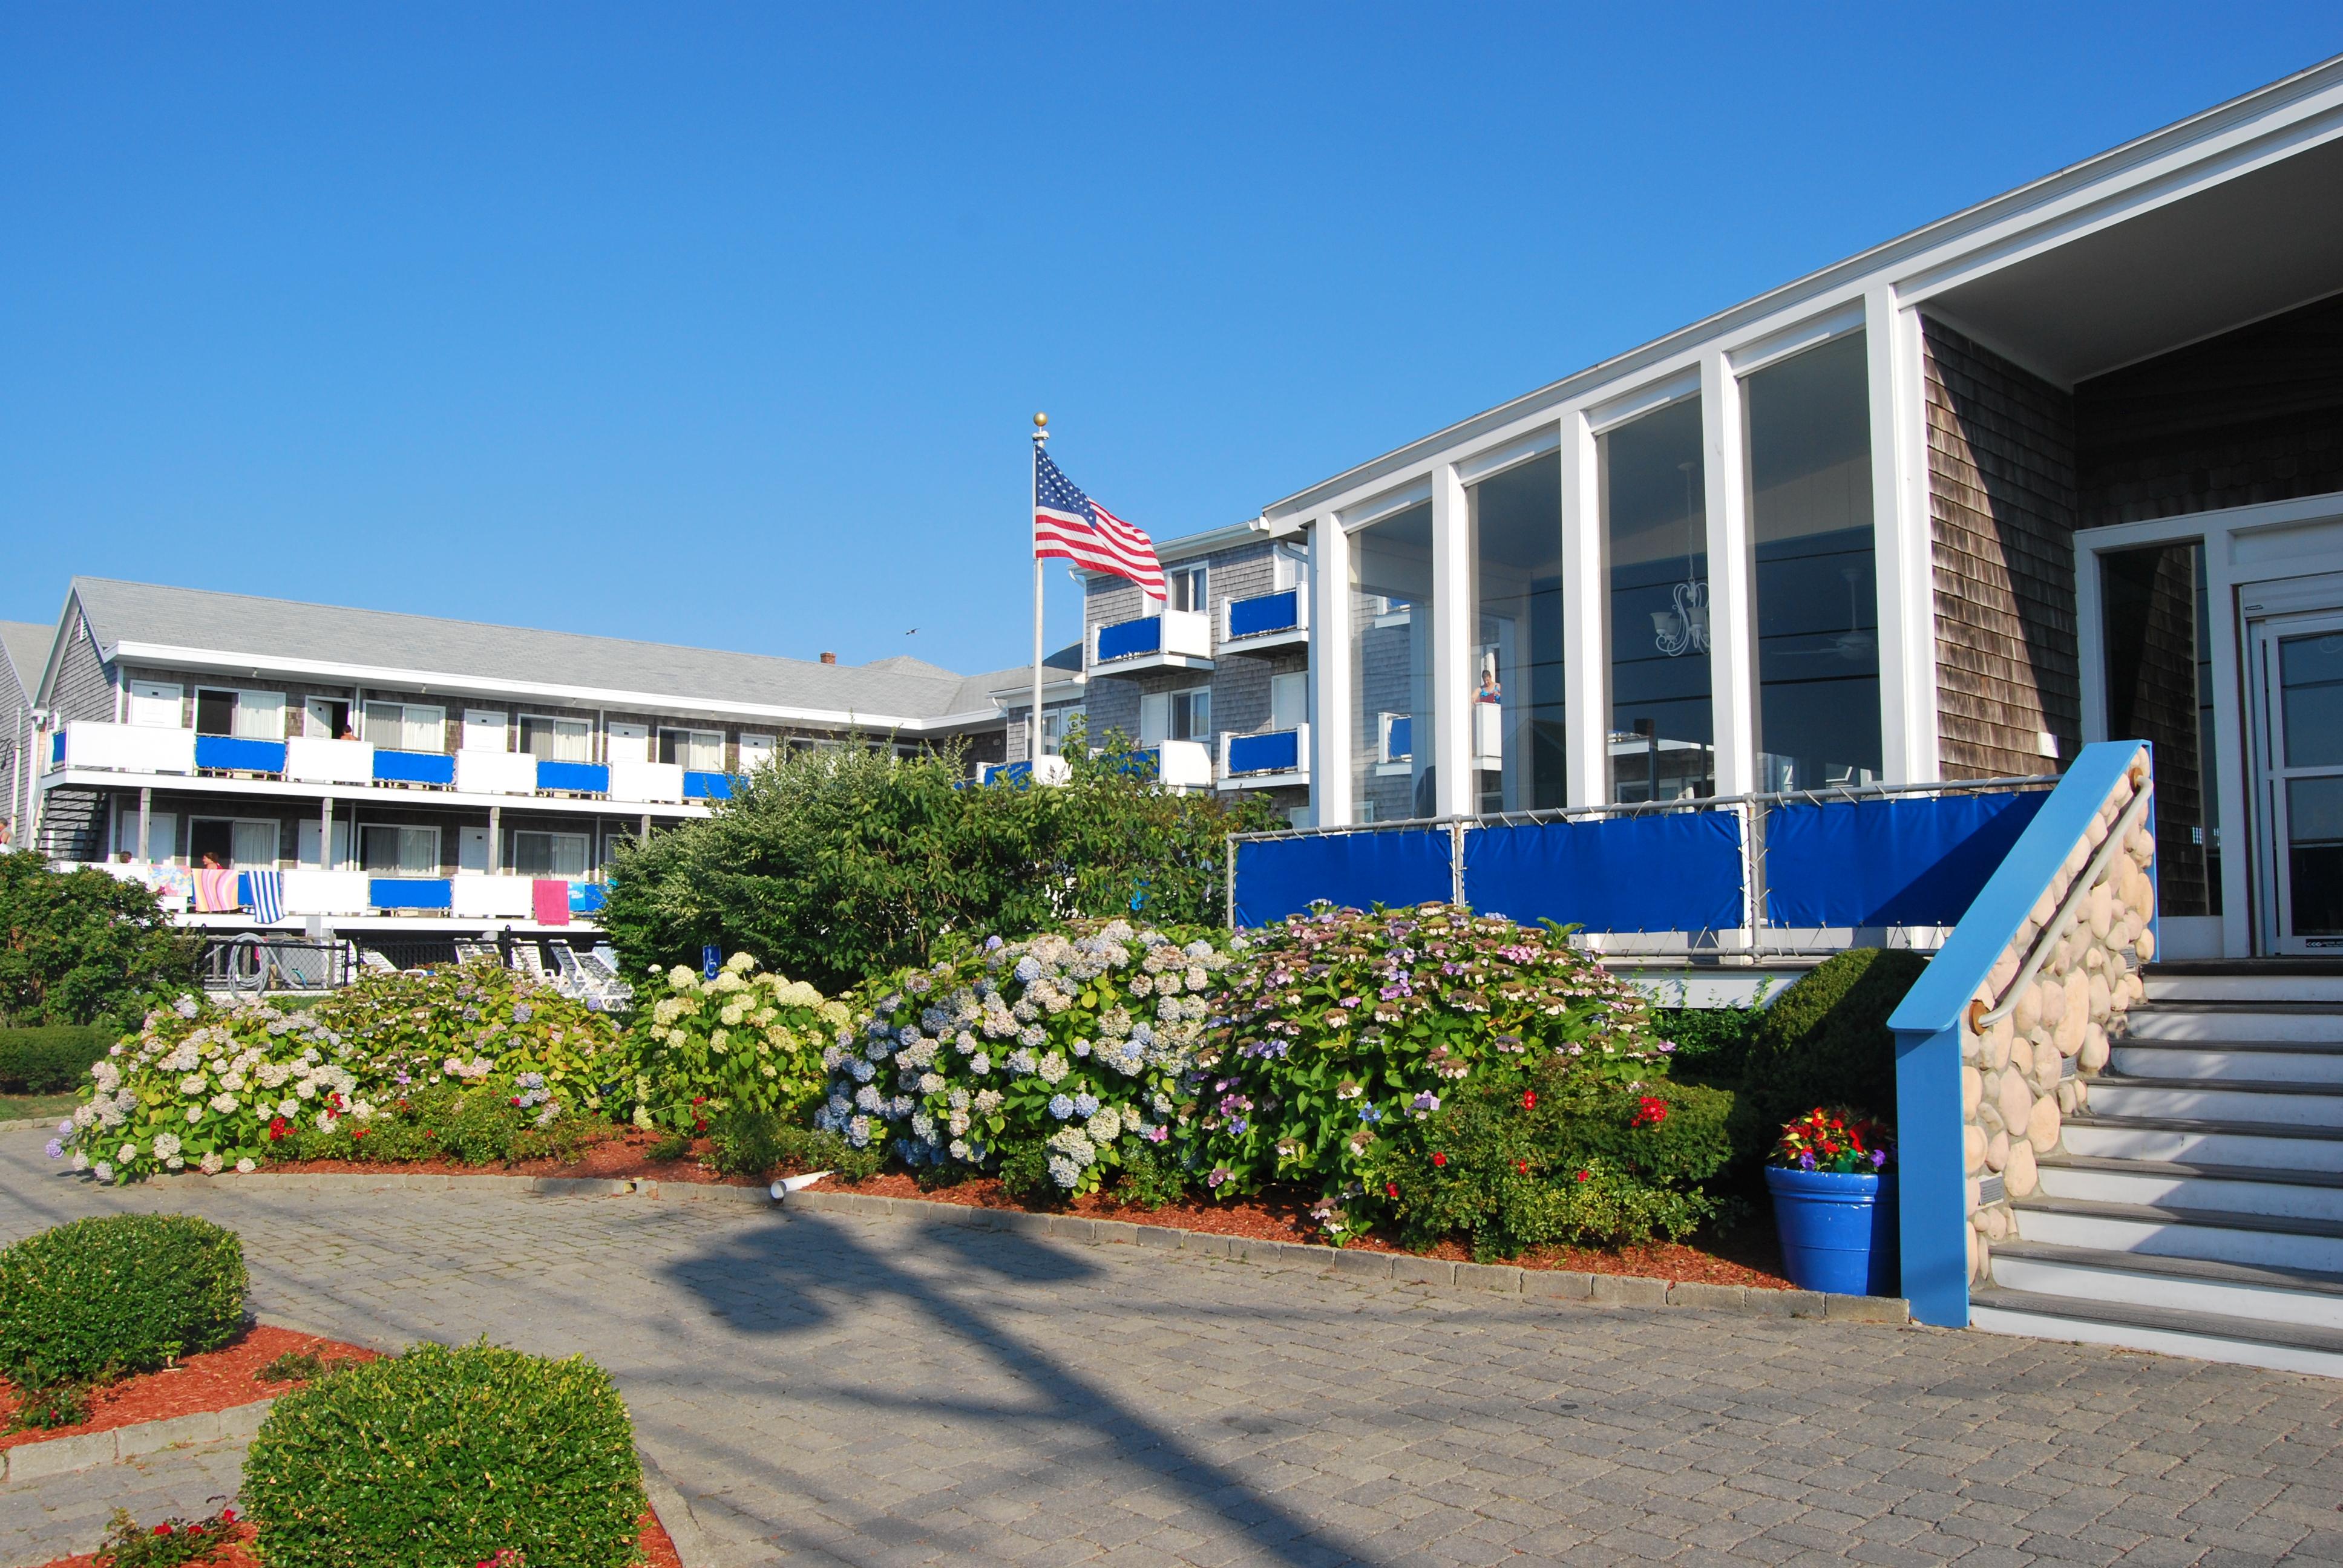 Rhode Island Beachfront Rental Now Off Season